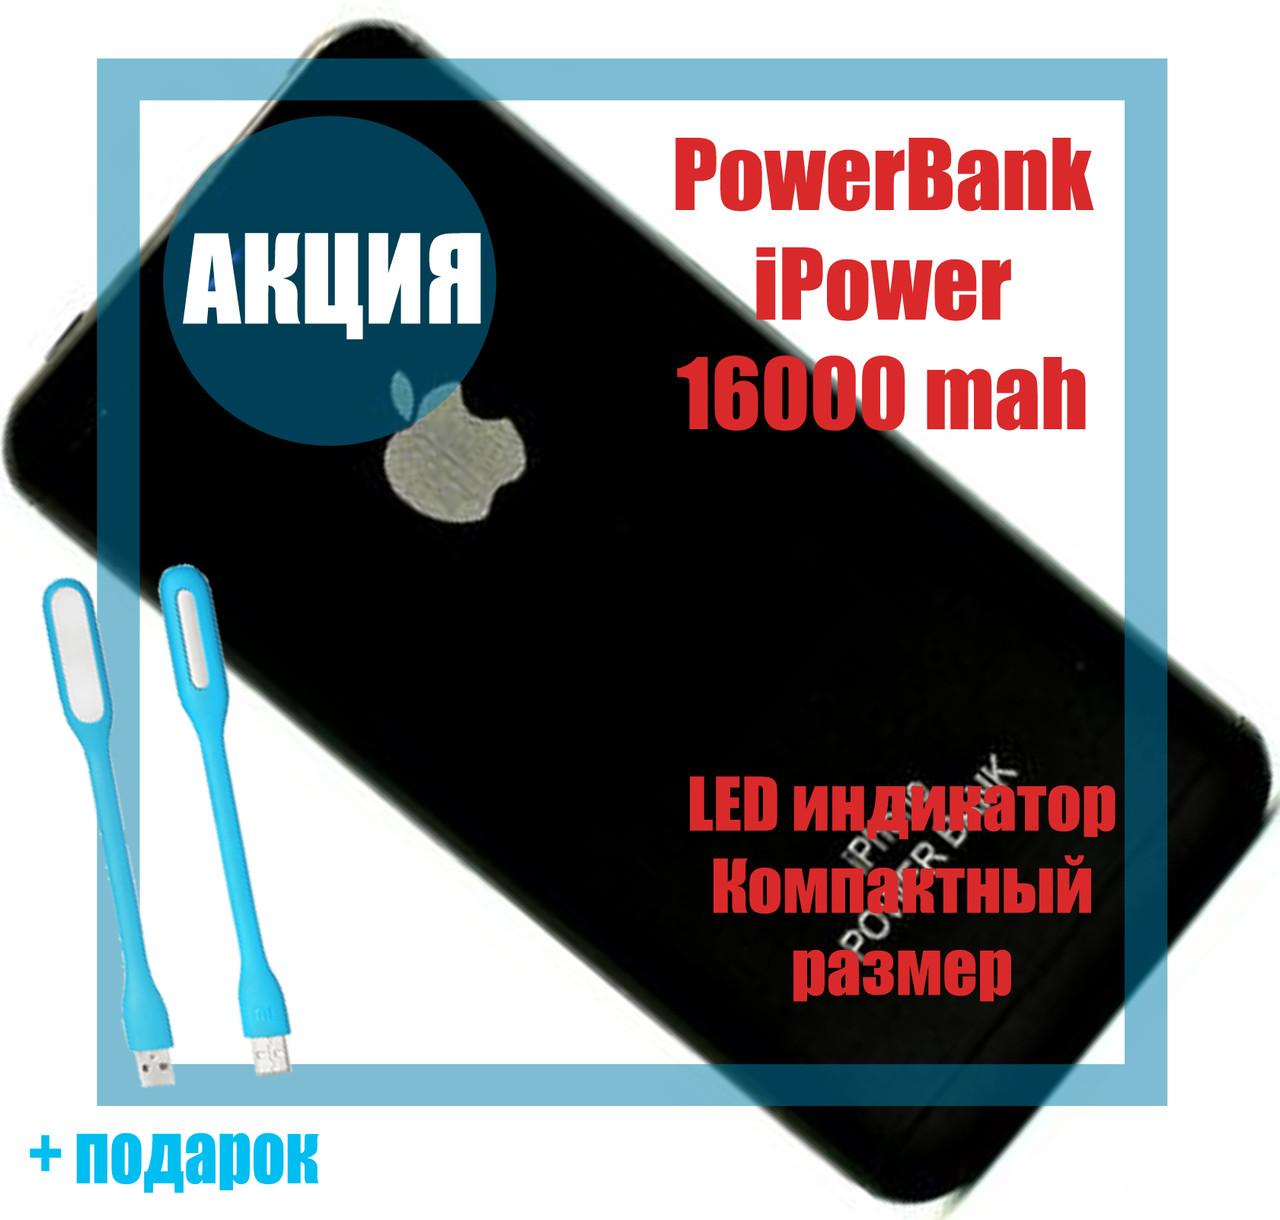 Power Bank IPower 16000 mAh - Универсальная батарея, внешний аккумулятор QualitiReplica